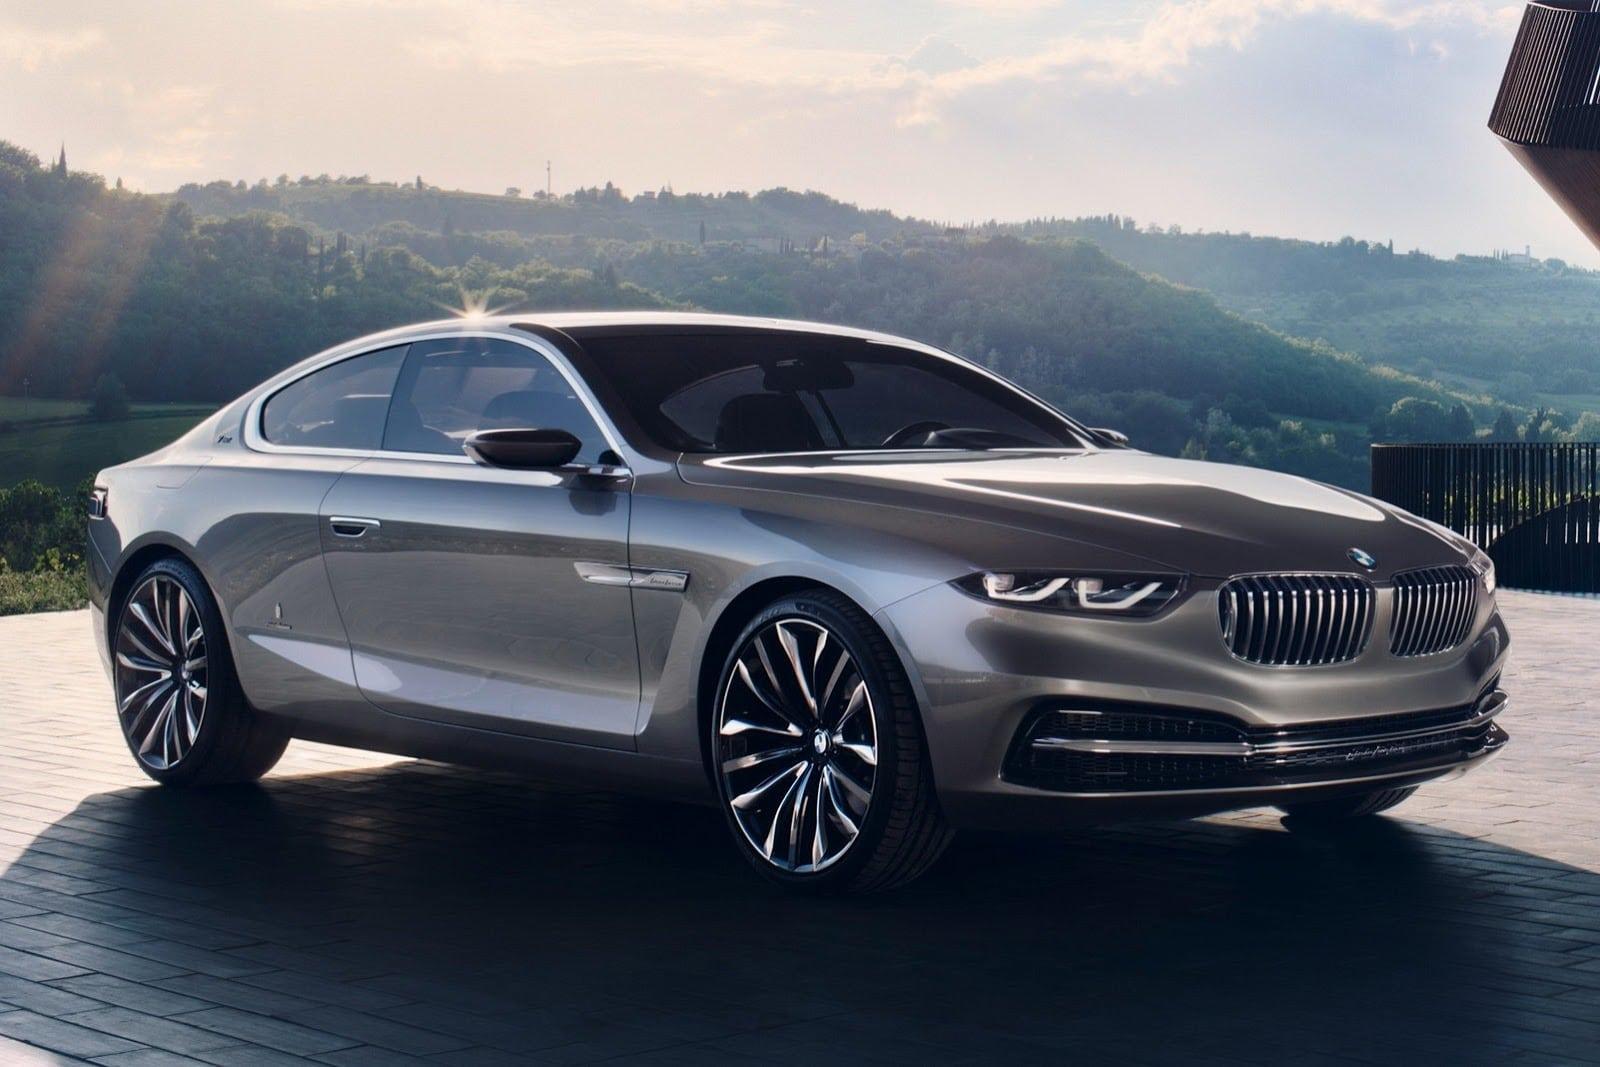 2020 BMW 530e Release date